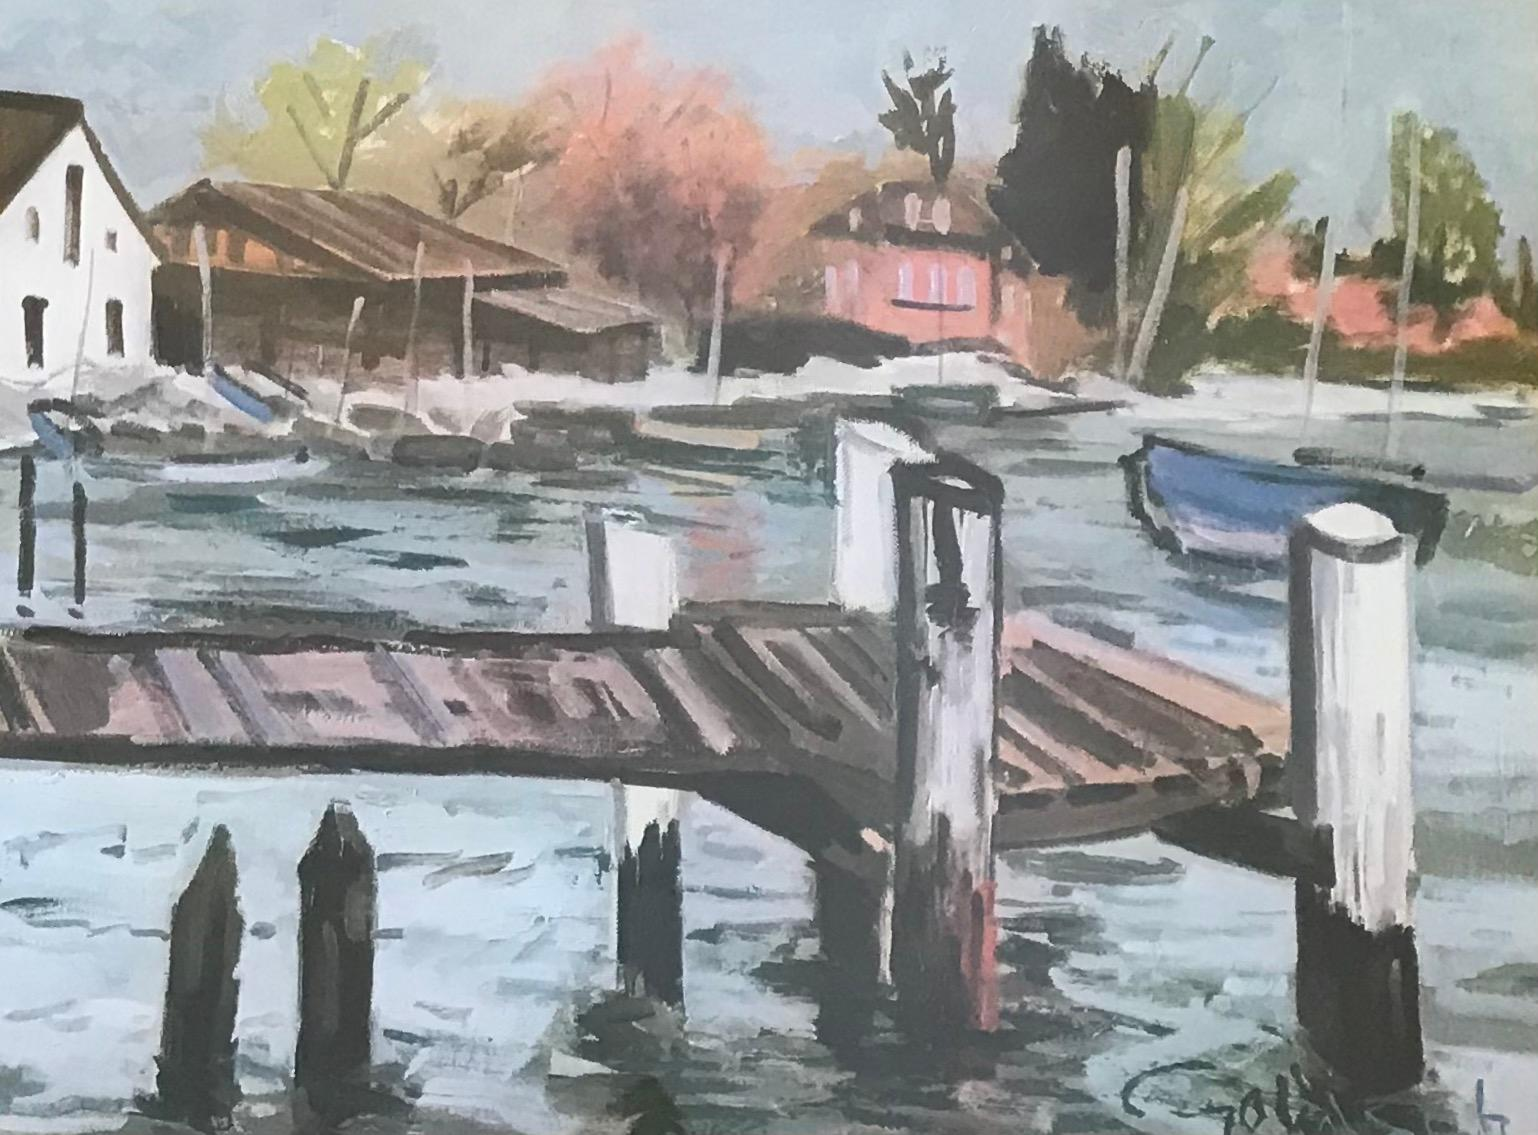 The pontoon